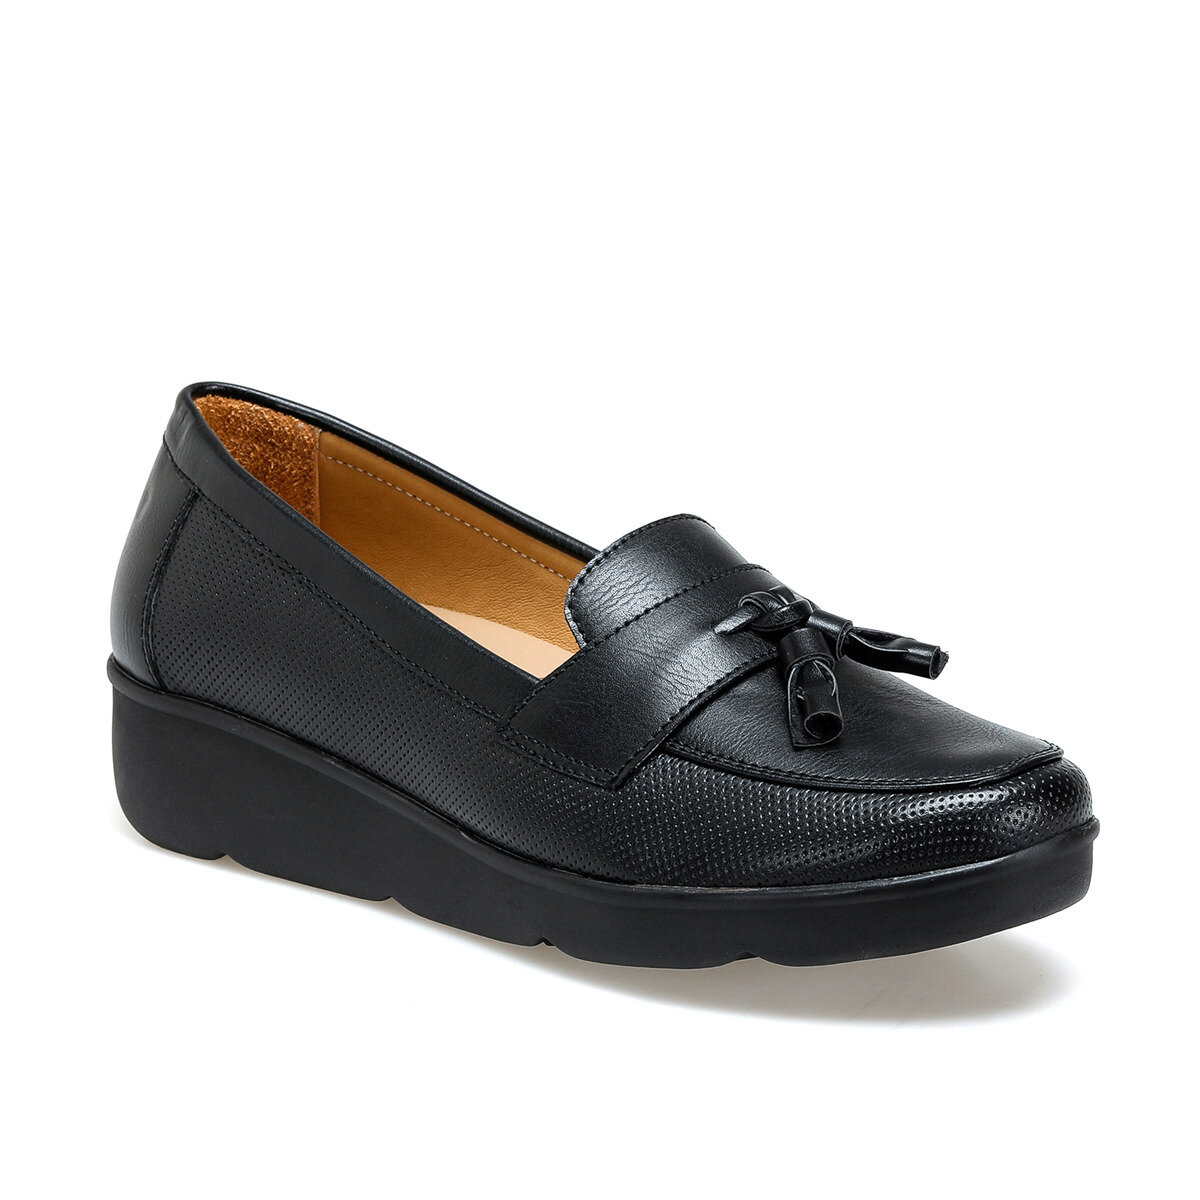 FLO 103055.Z Black Women Shoes Polaris 5 Point